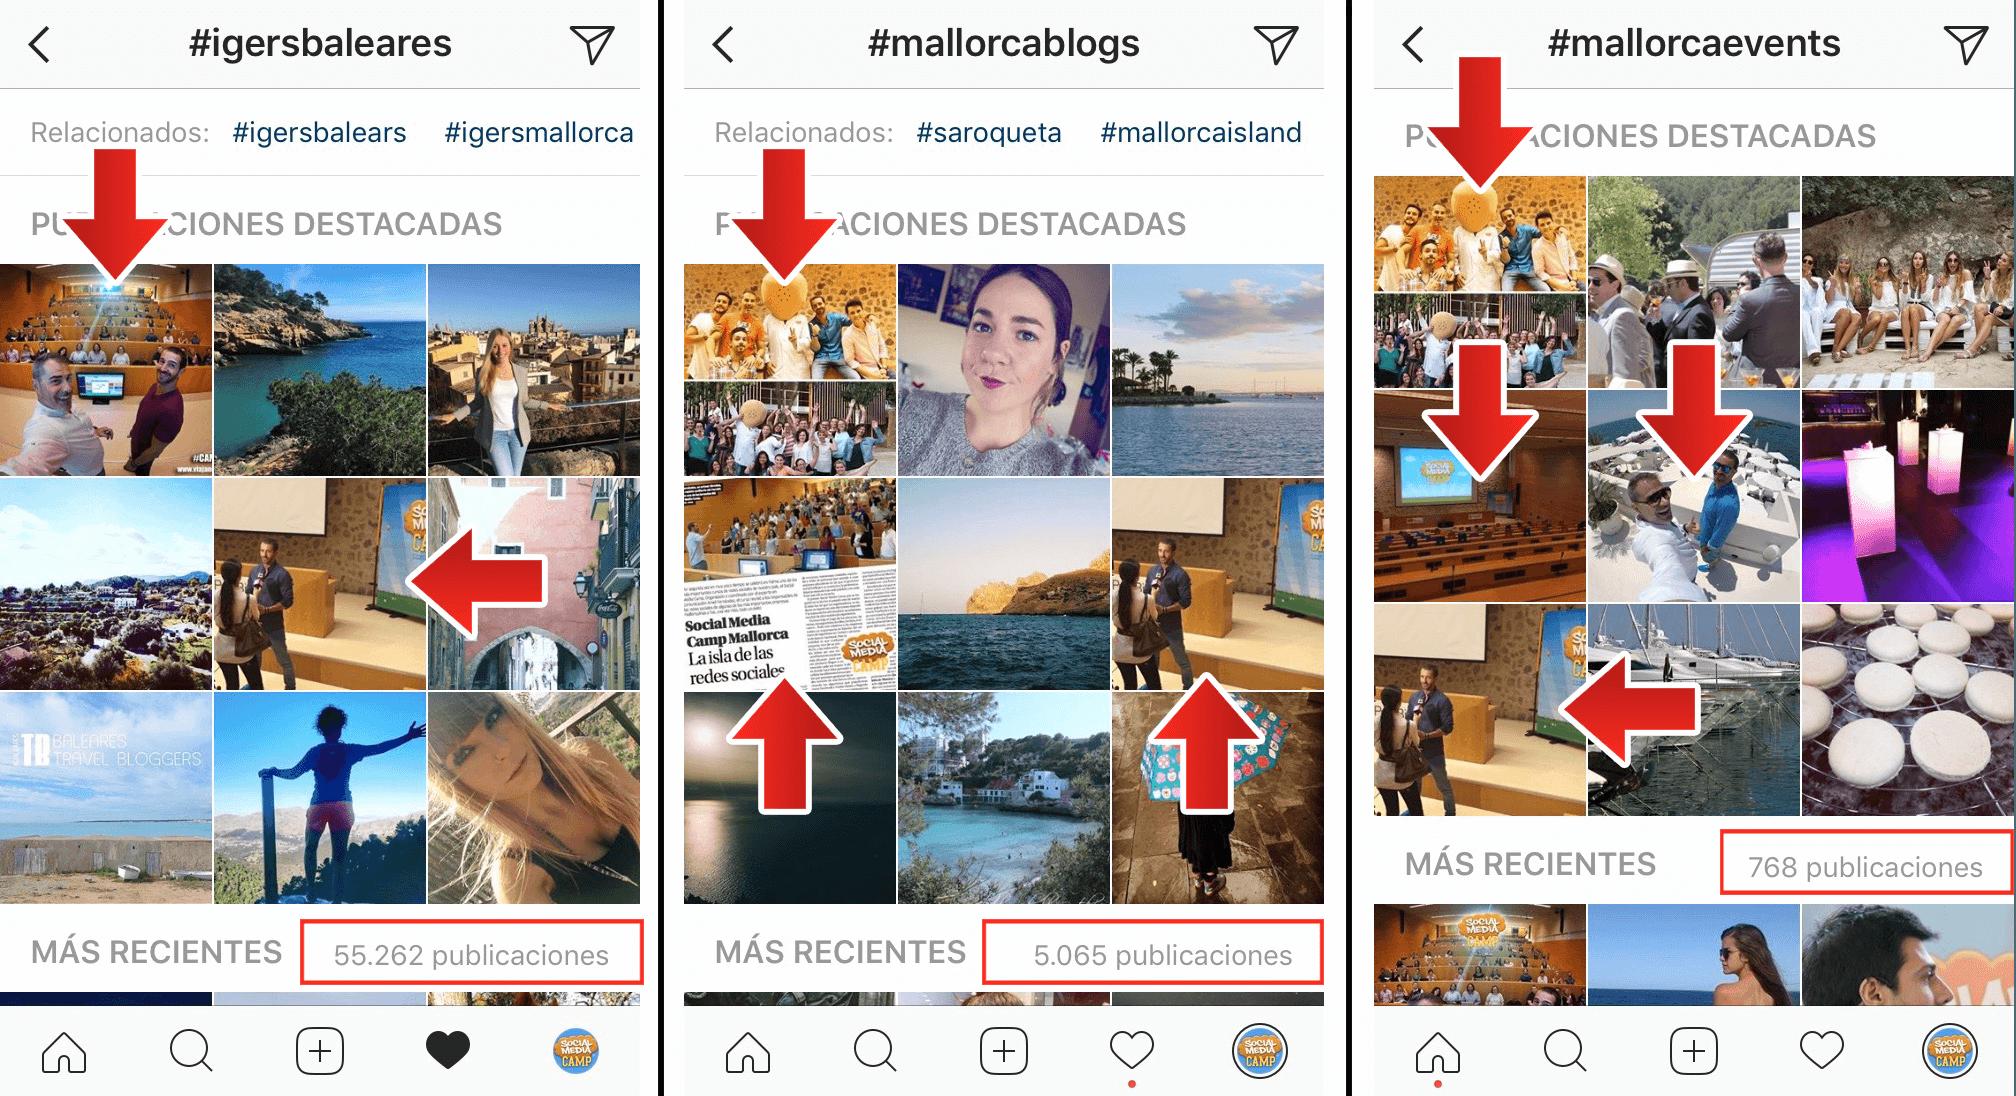 algoritmo-de-instagram-HT-search-2-2018